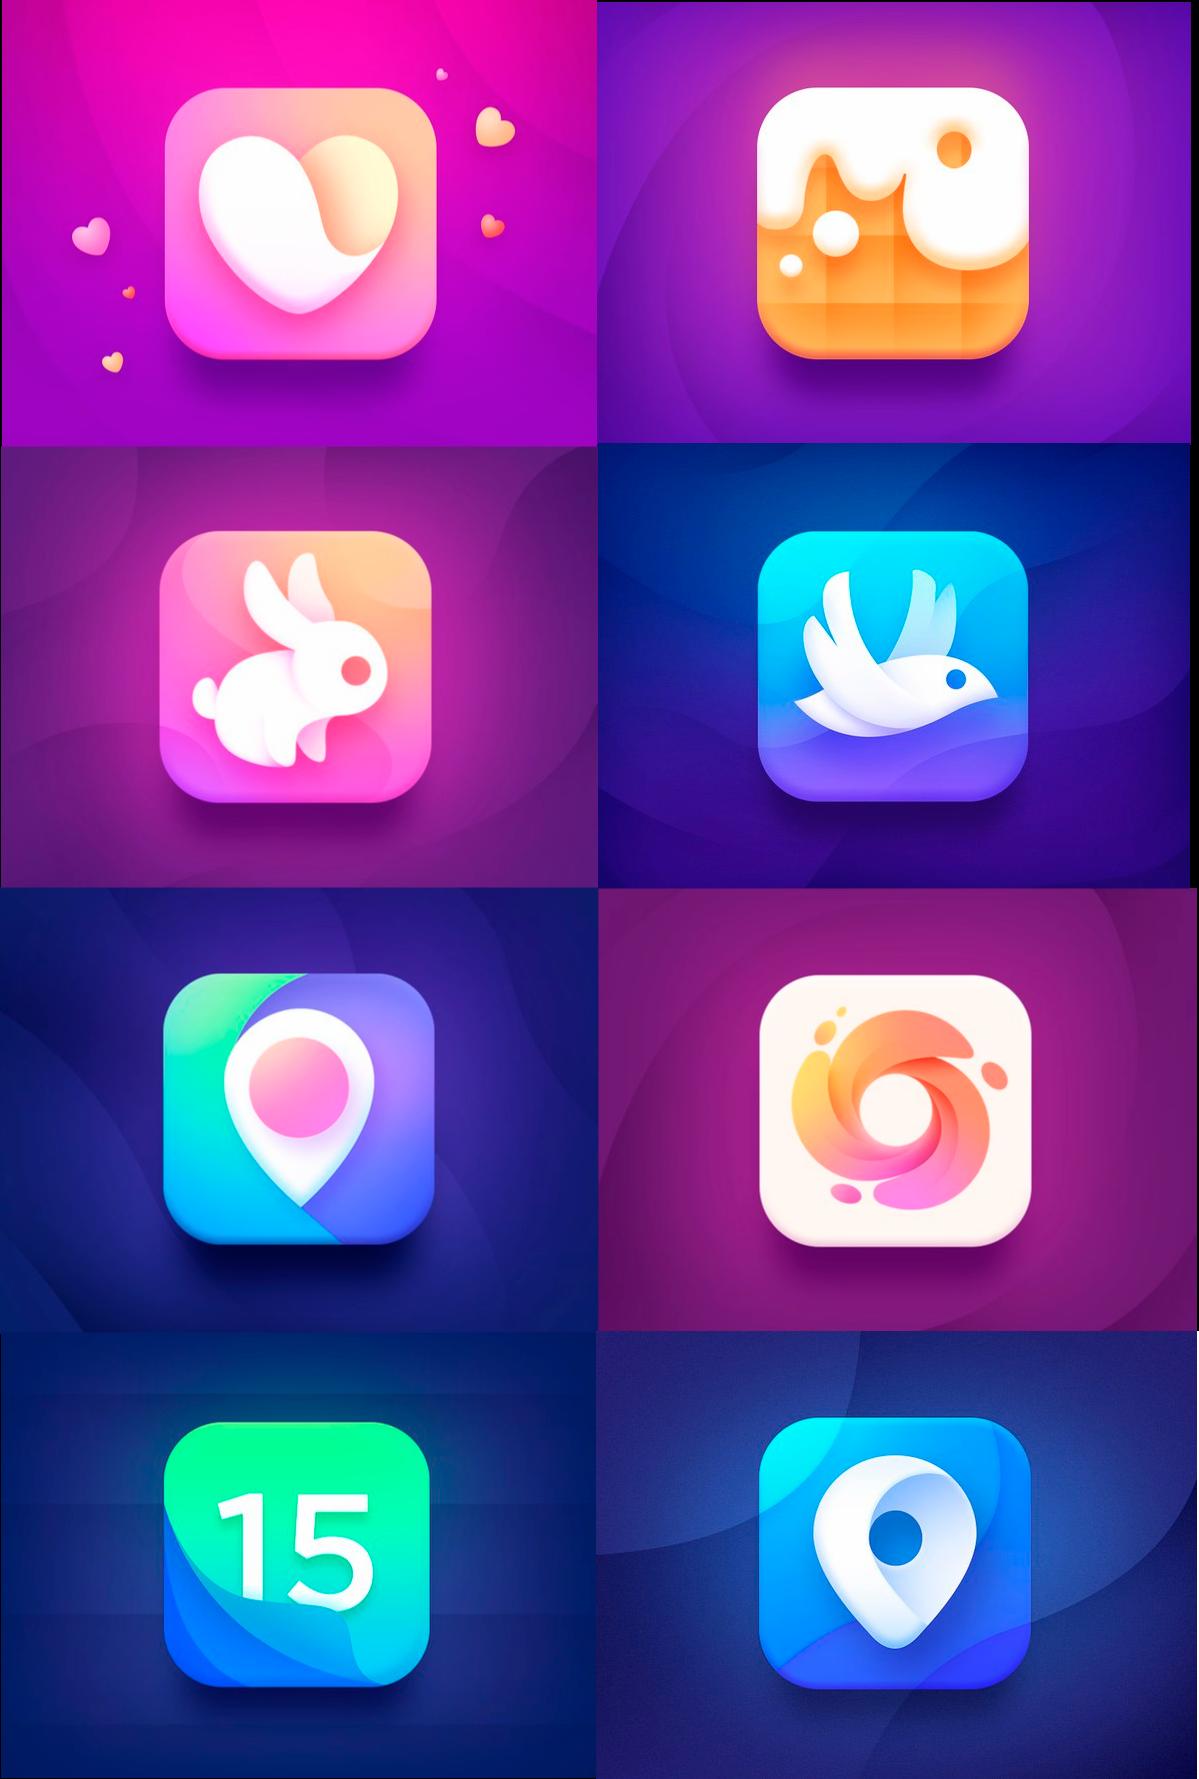 Https Dribbble Com Neststrix Web Design Icon App Icon Design Icon Design